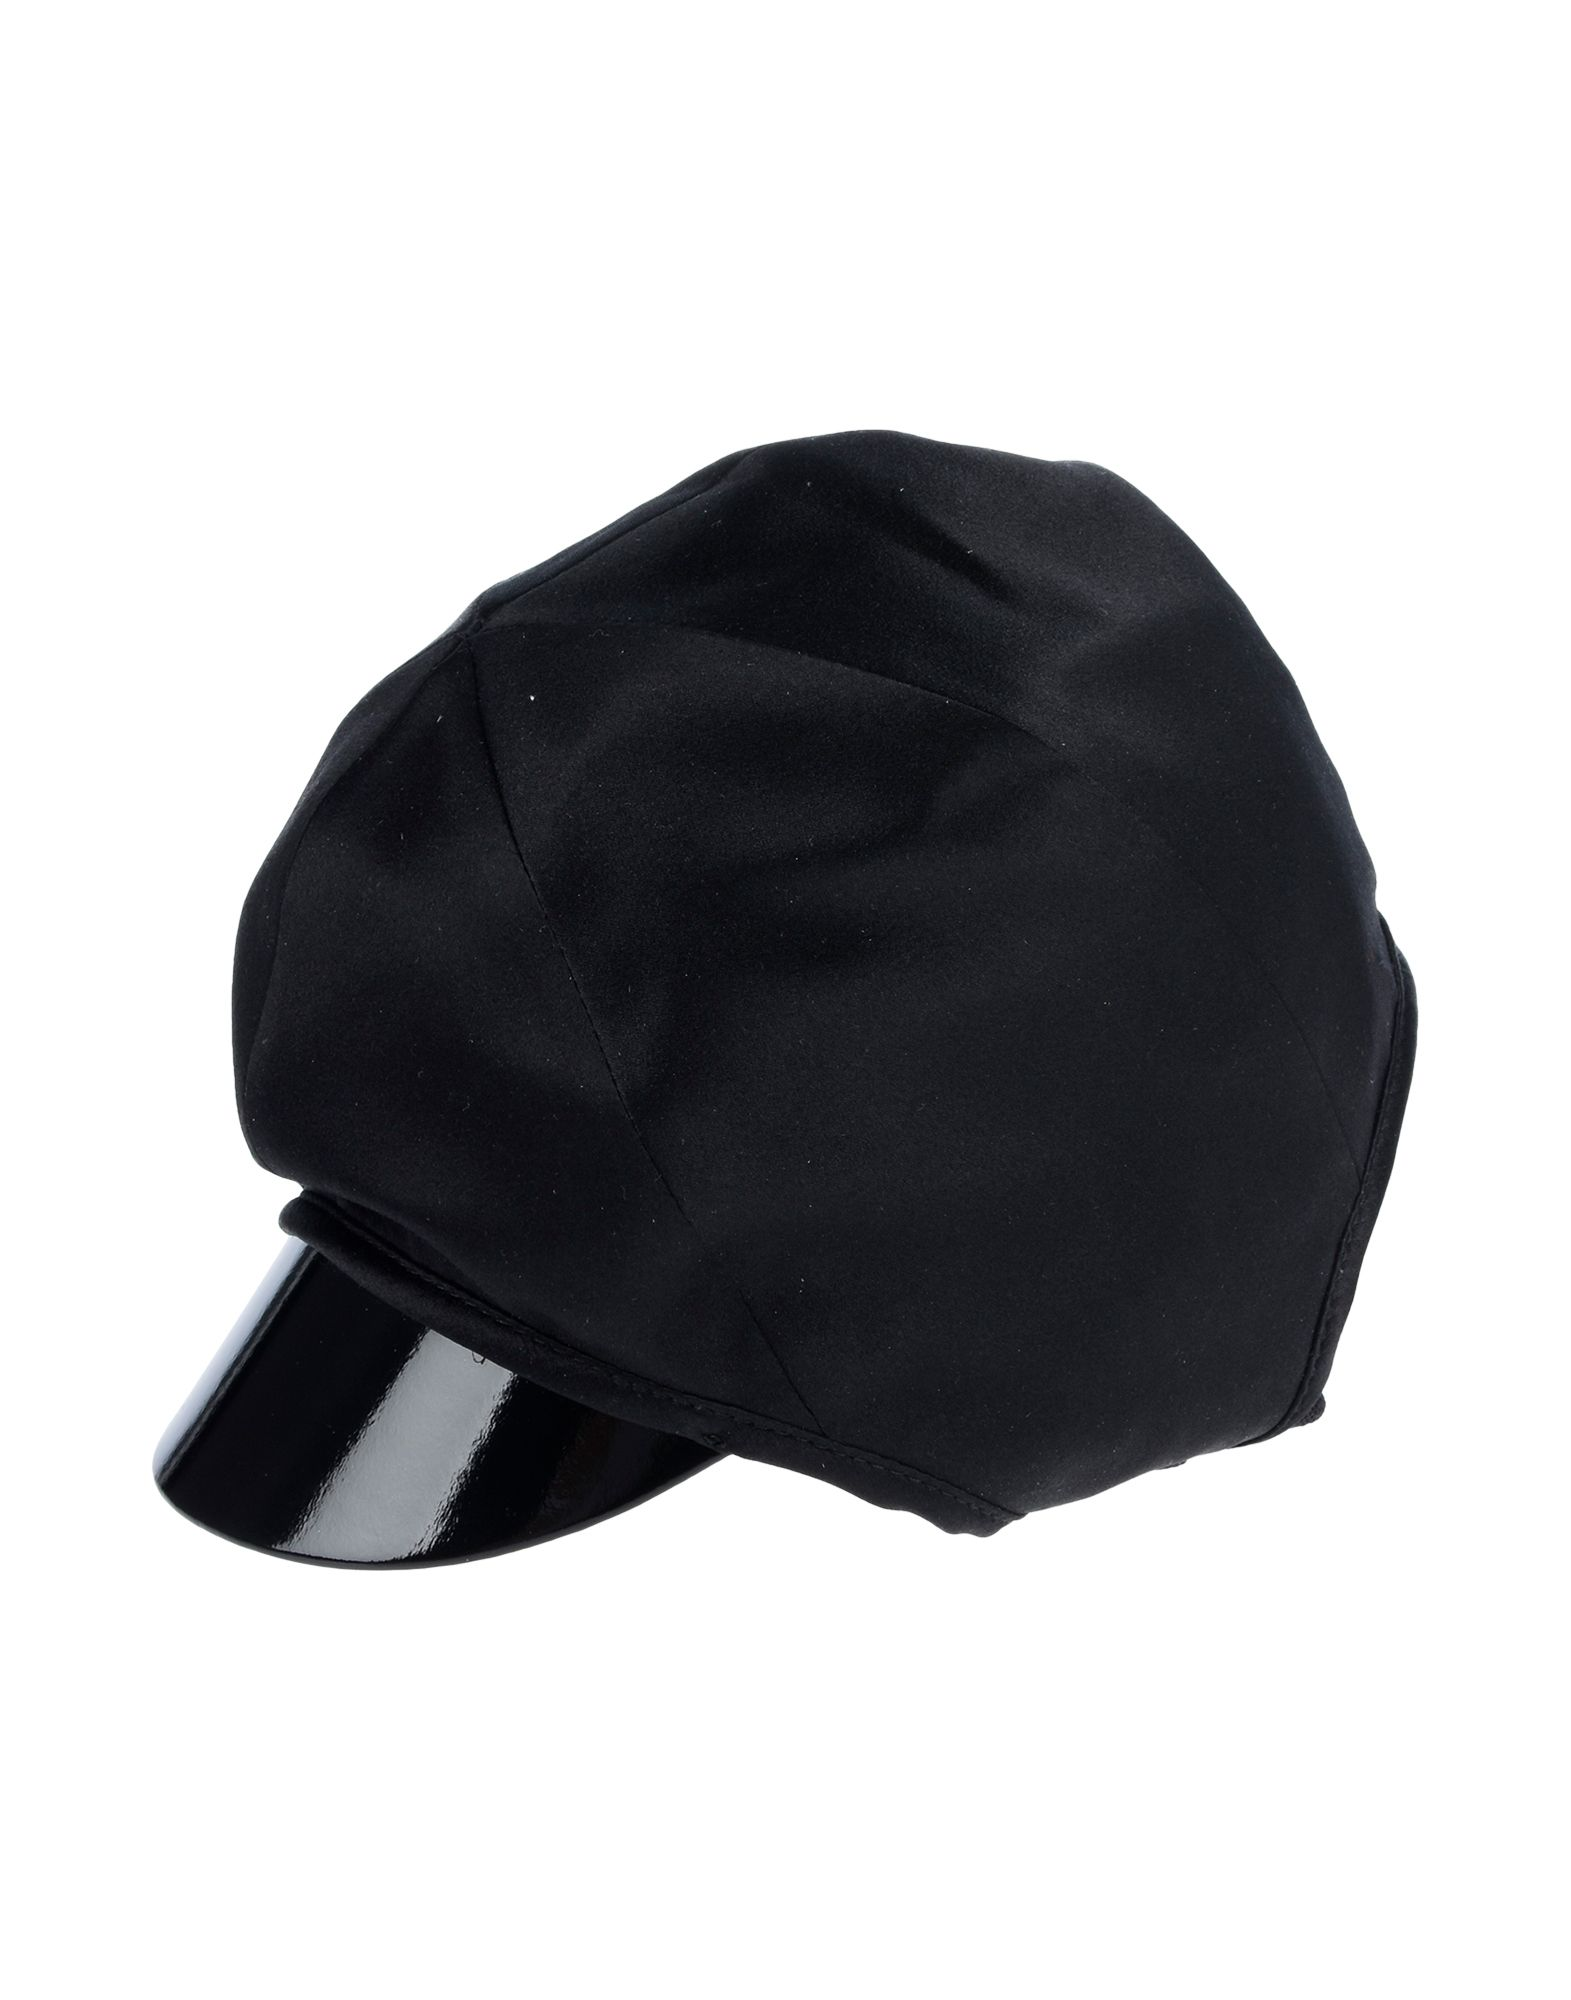 GUCCI Hats. satin, no appliqués, basic solid color. 100% Silk, Polyester, Elastane